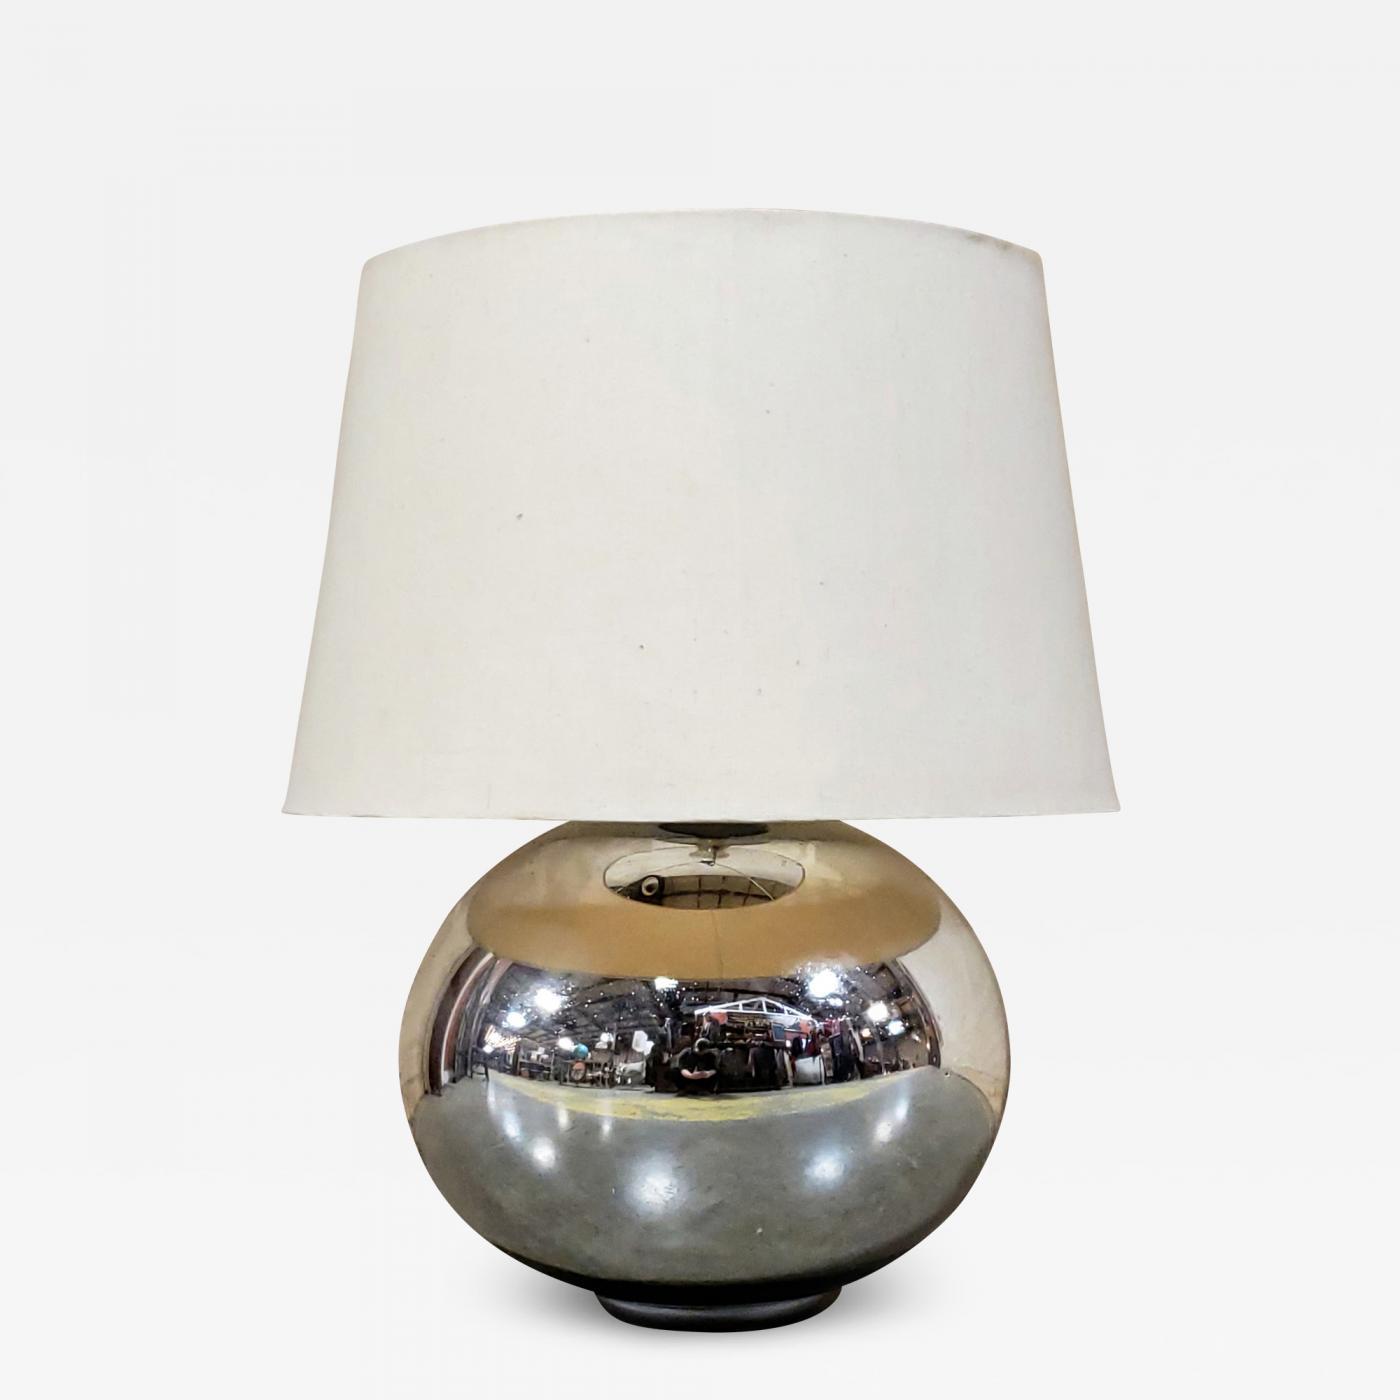 Large Vintage Mercury Glass Lamp